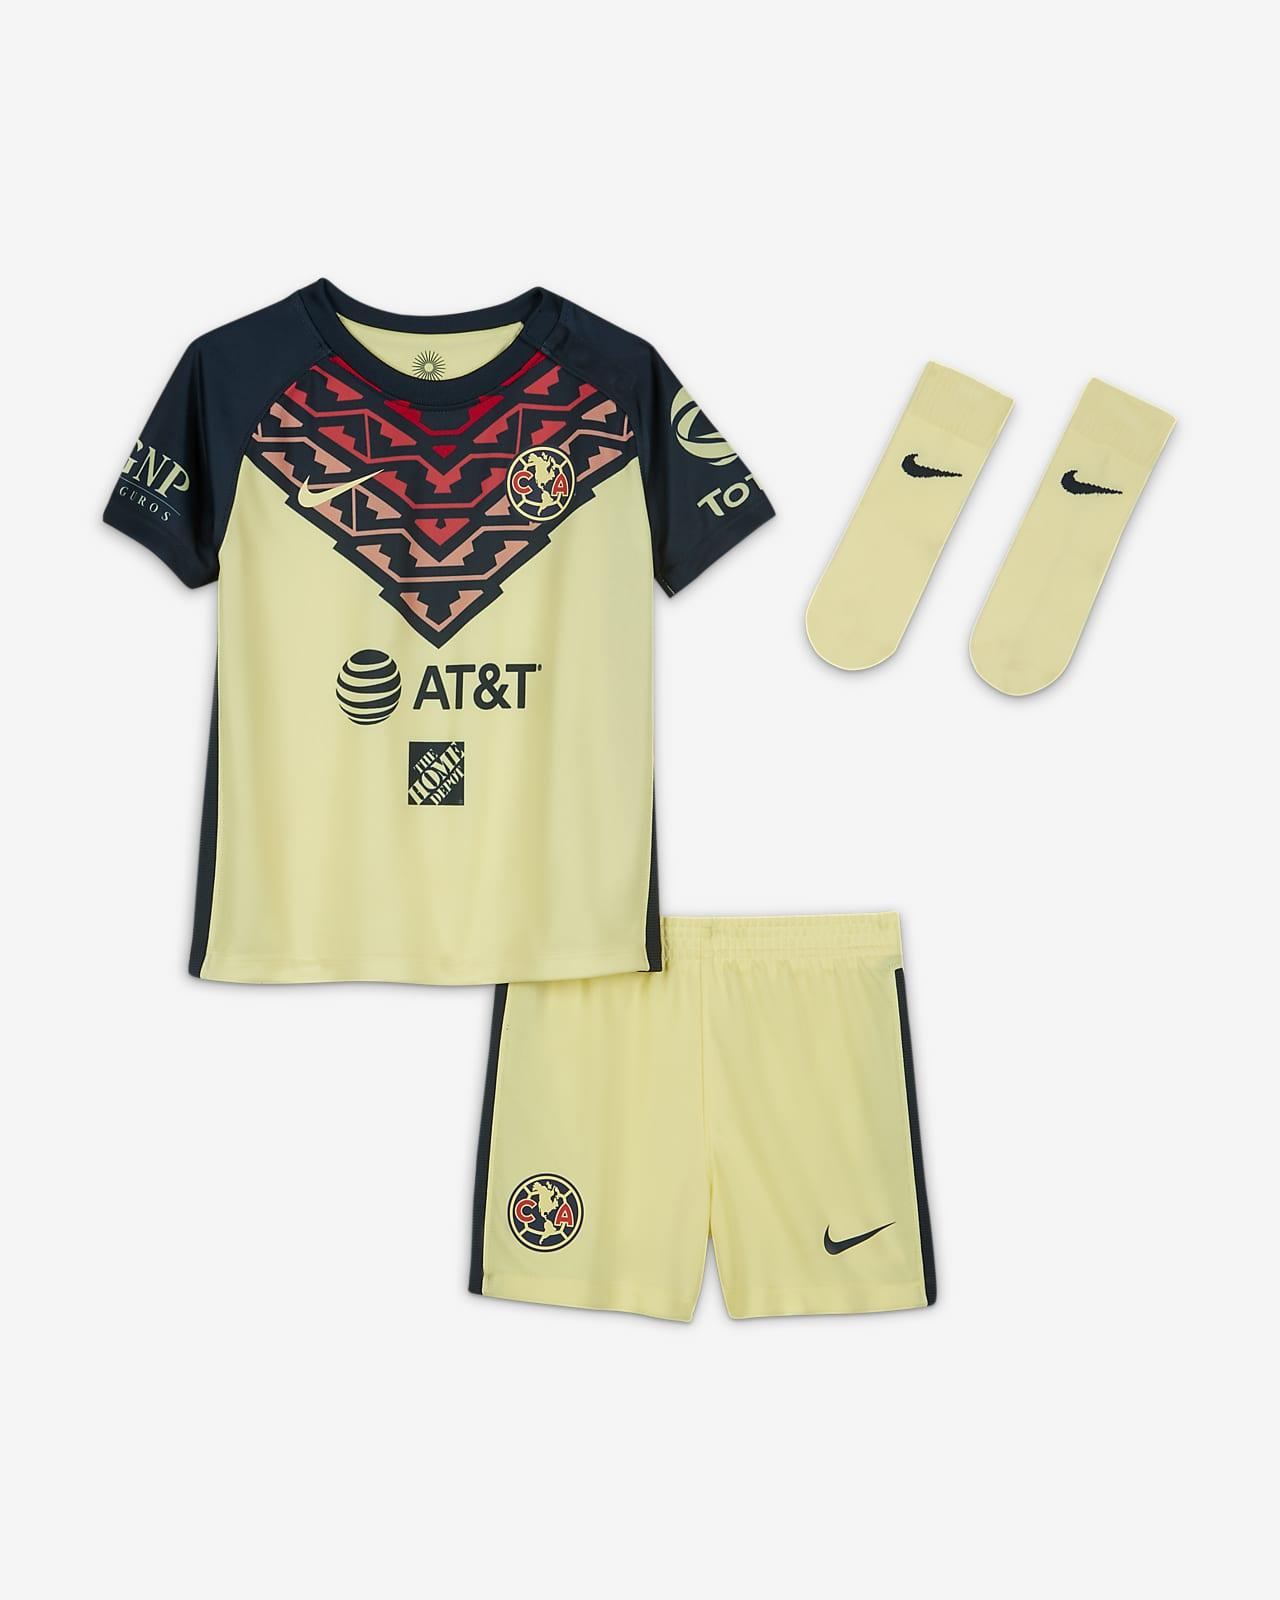 Kit de fútbol del Club América local 2021/22 para bebé e infantil